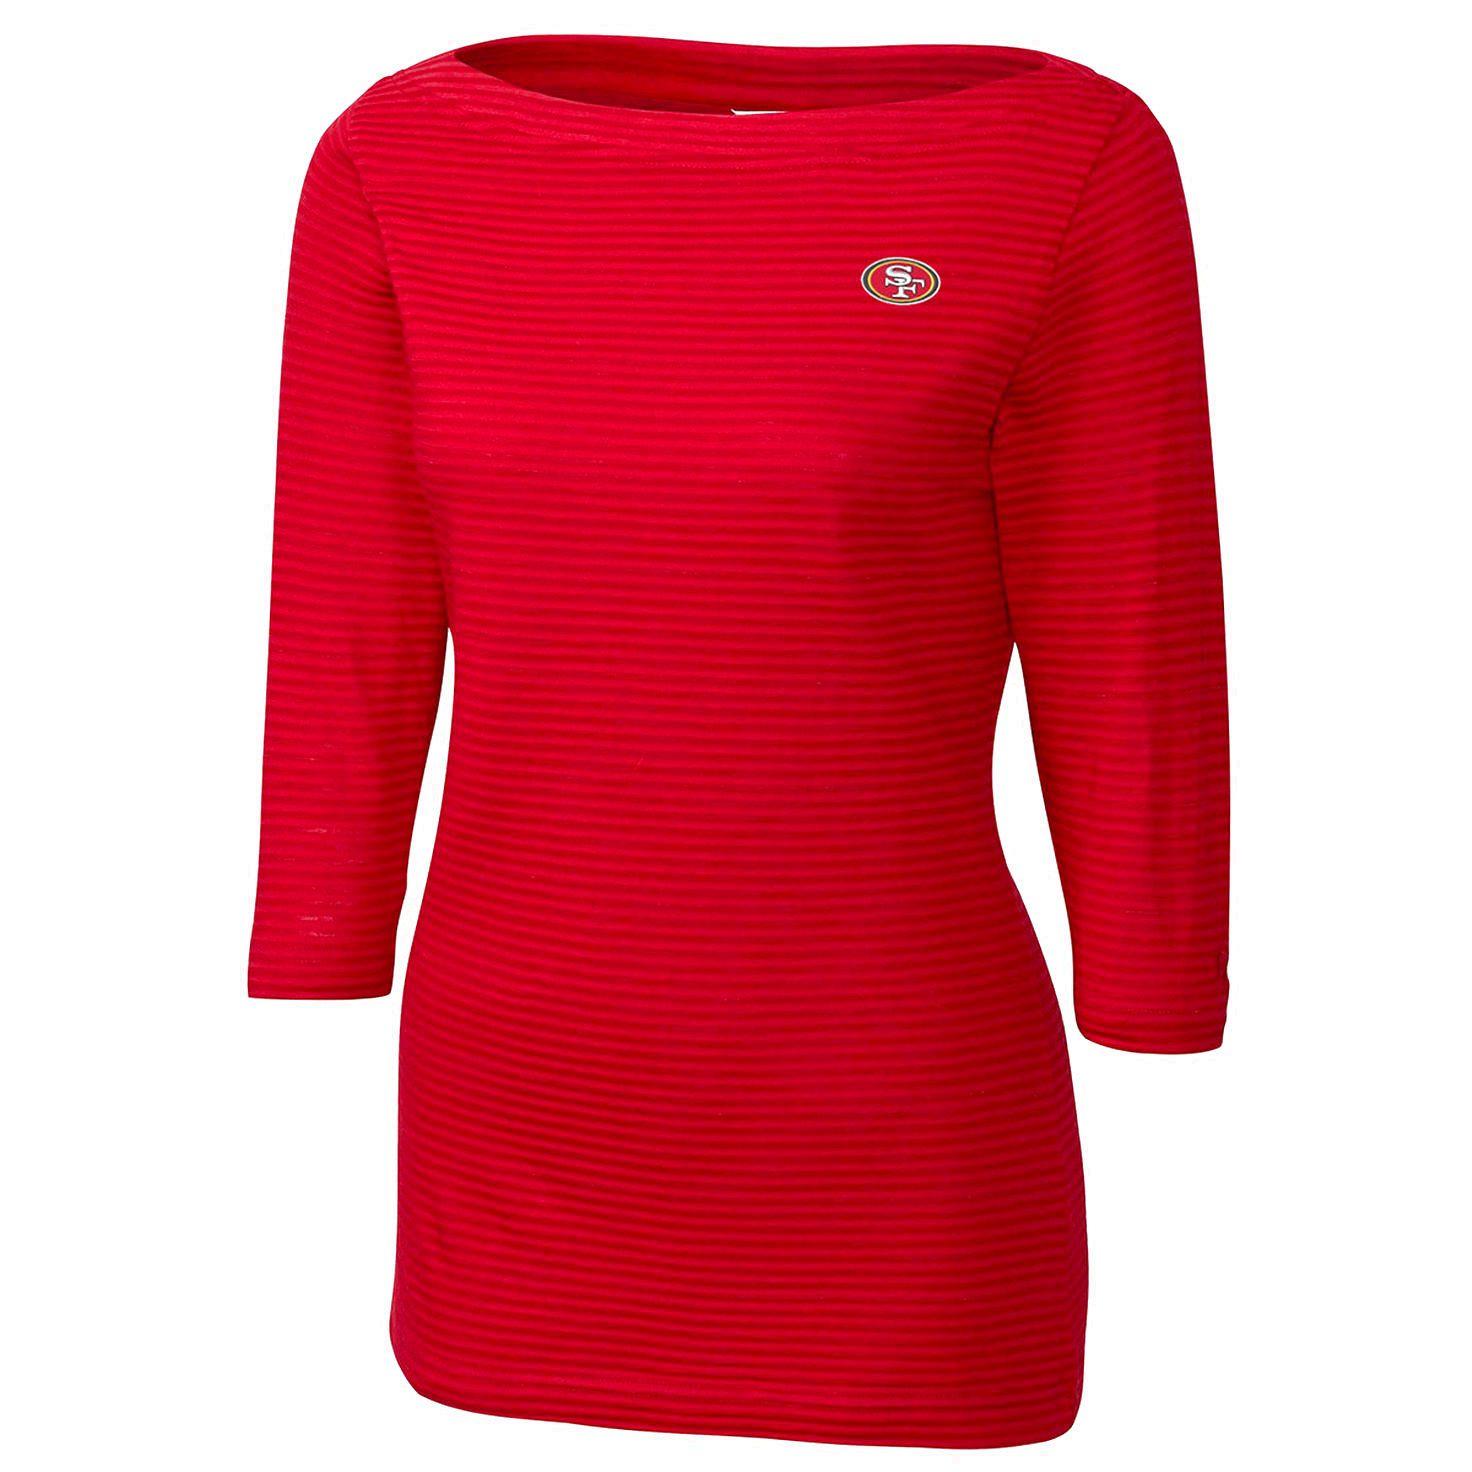 San Francisco 49ers Cutter & Buck Women's Holly Park Tonal Stripe 3/4-Sleeve Knit T-Shirt - Scarlet - $51.99